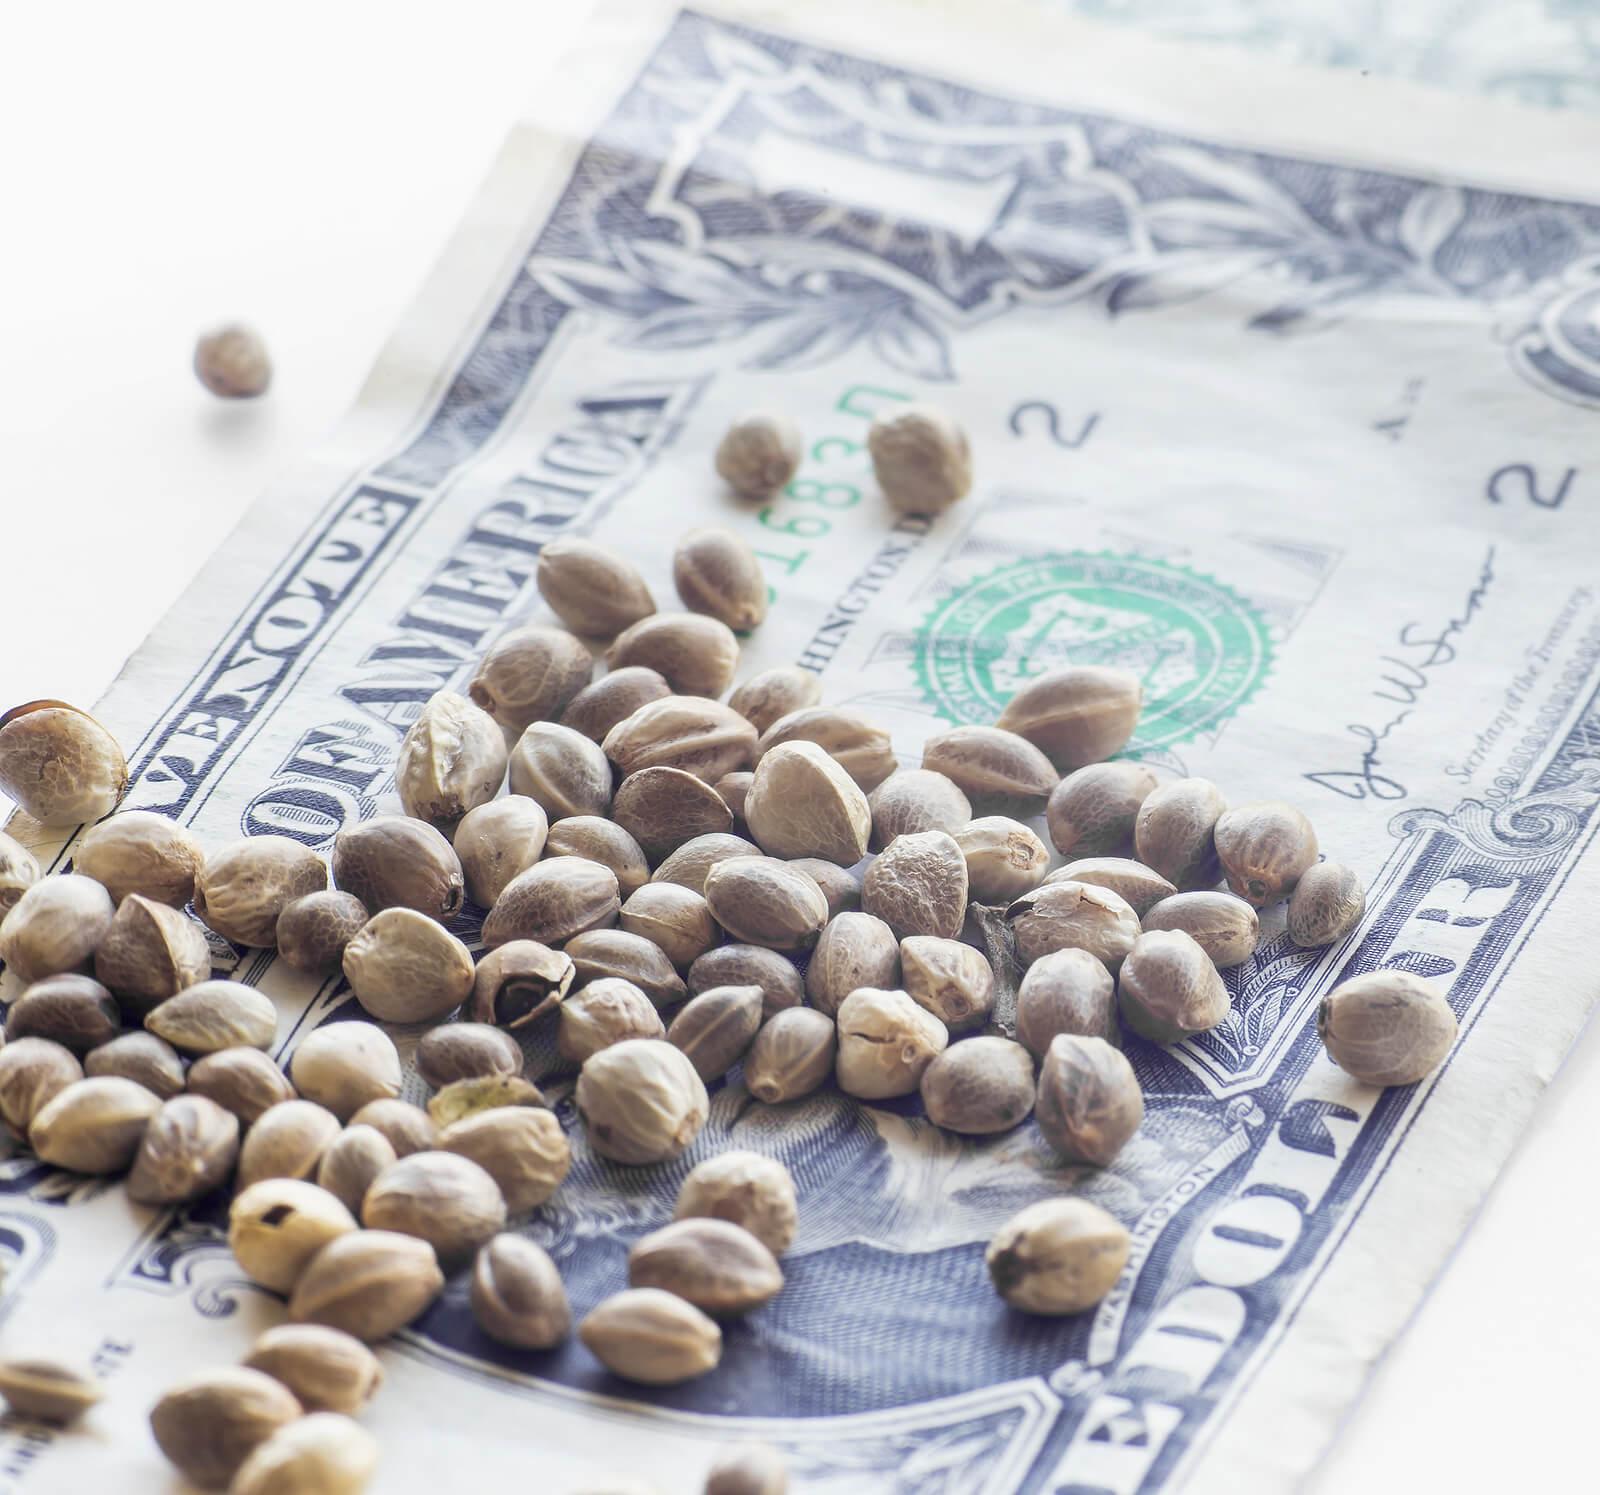 Buy Marijuana Seeds In Nashville